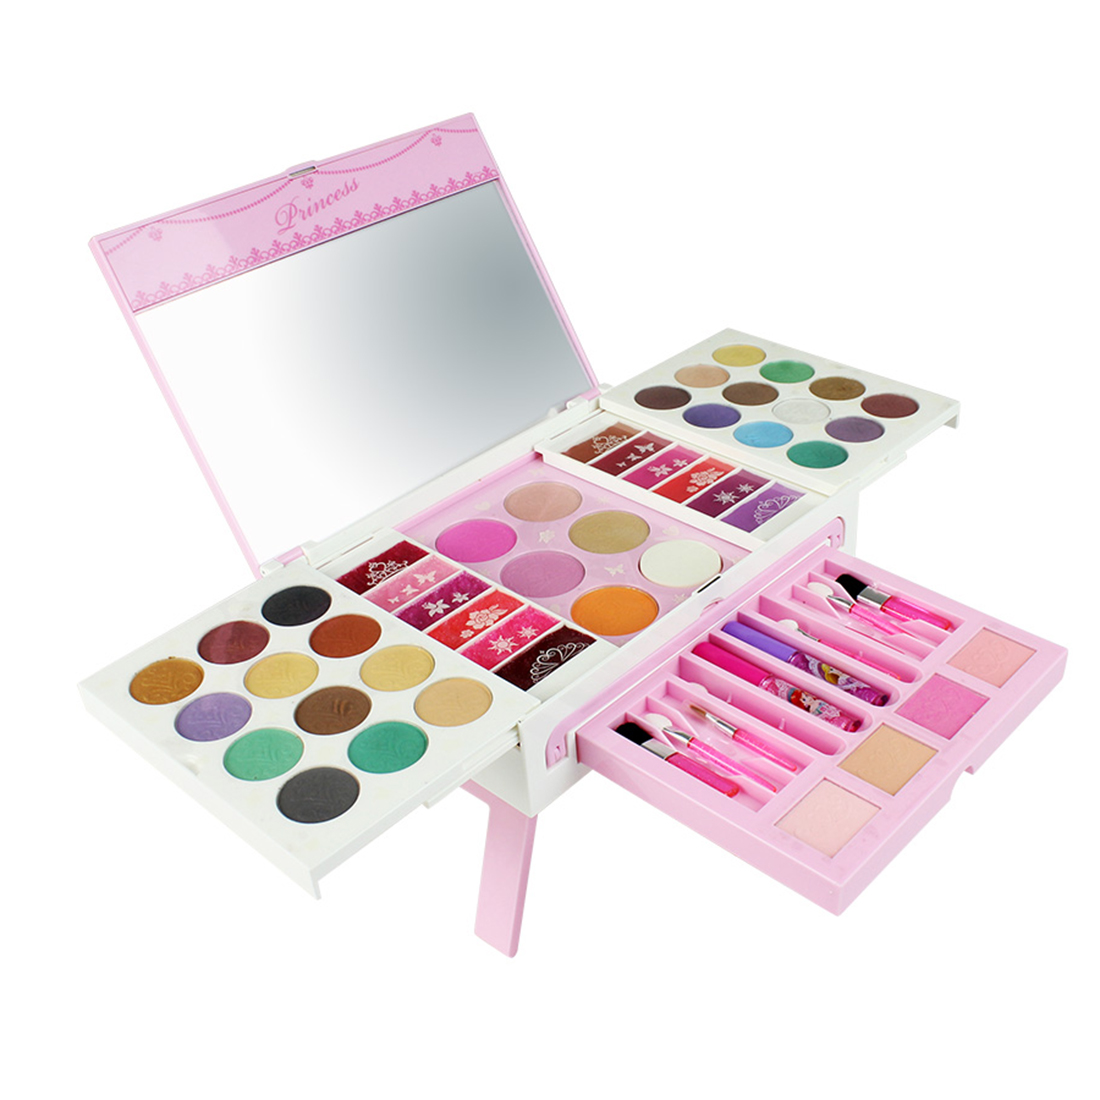 ¡Nuevo! Juego de 52 unids/set de juguetes de simulación de belleza para niñas, juego de cosméticos de maquillaje con maleta Hismith máquina de sexo adaptador sexo juguetes para adultos 4,5